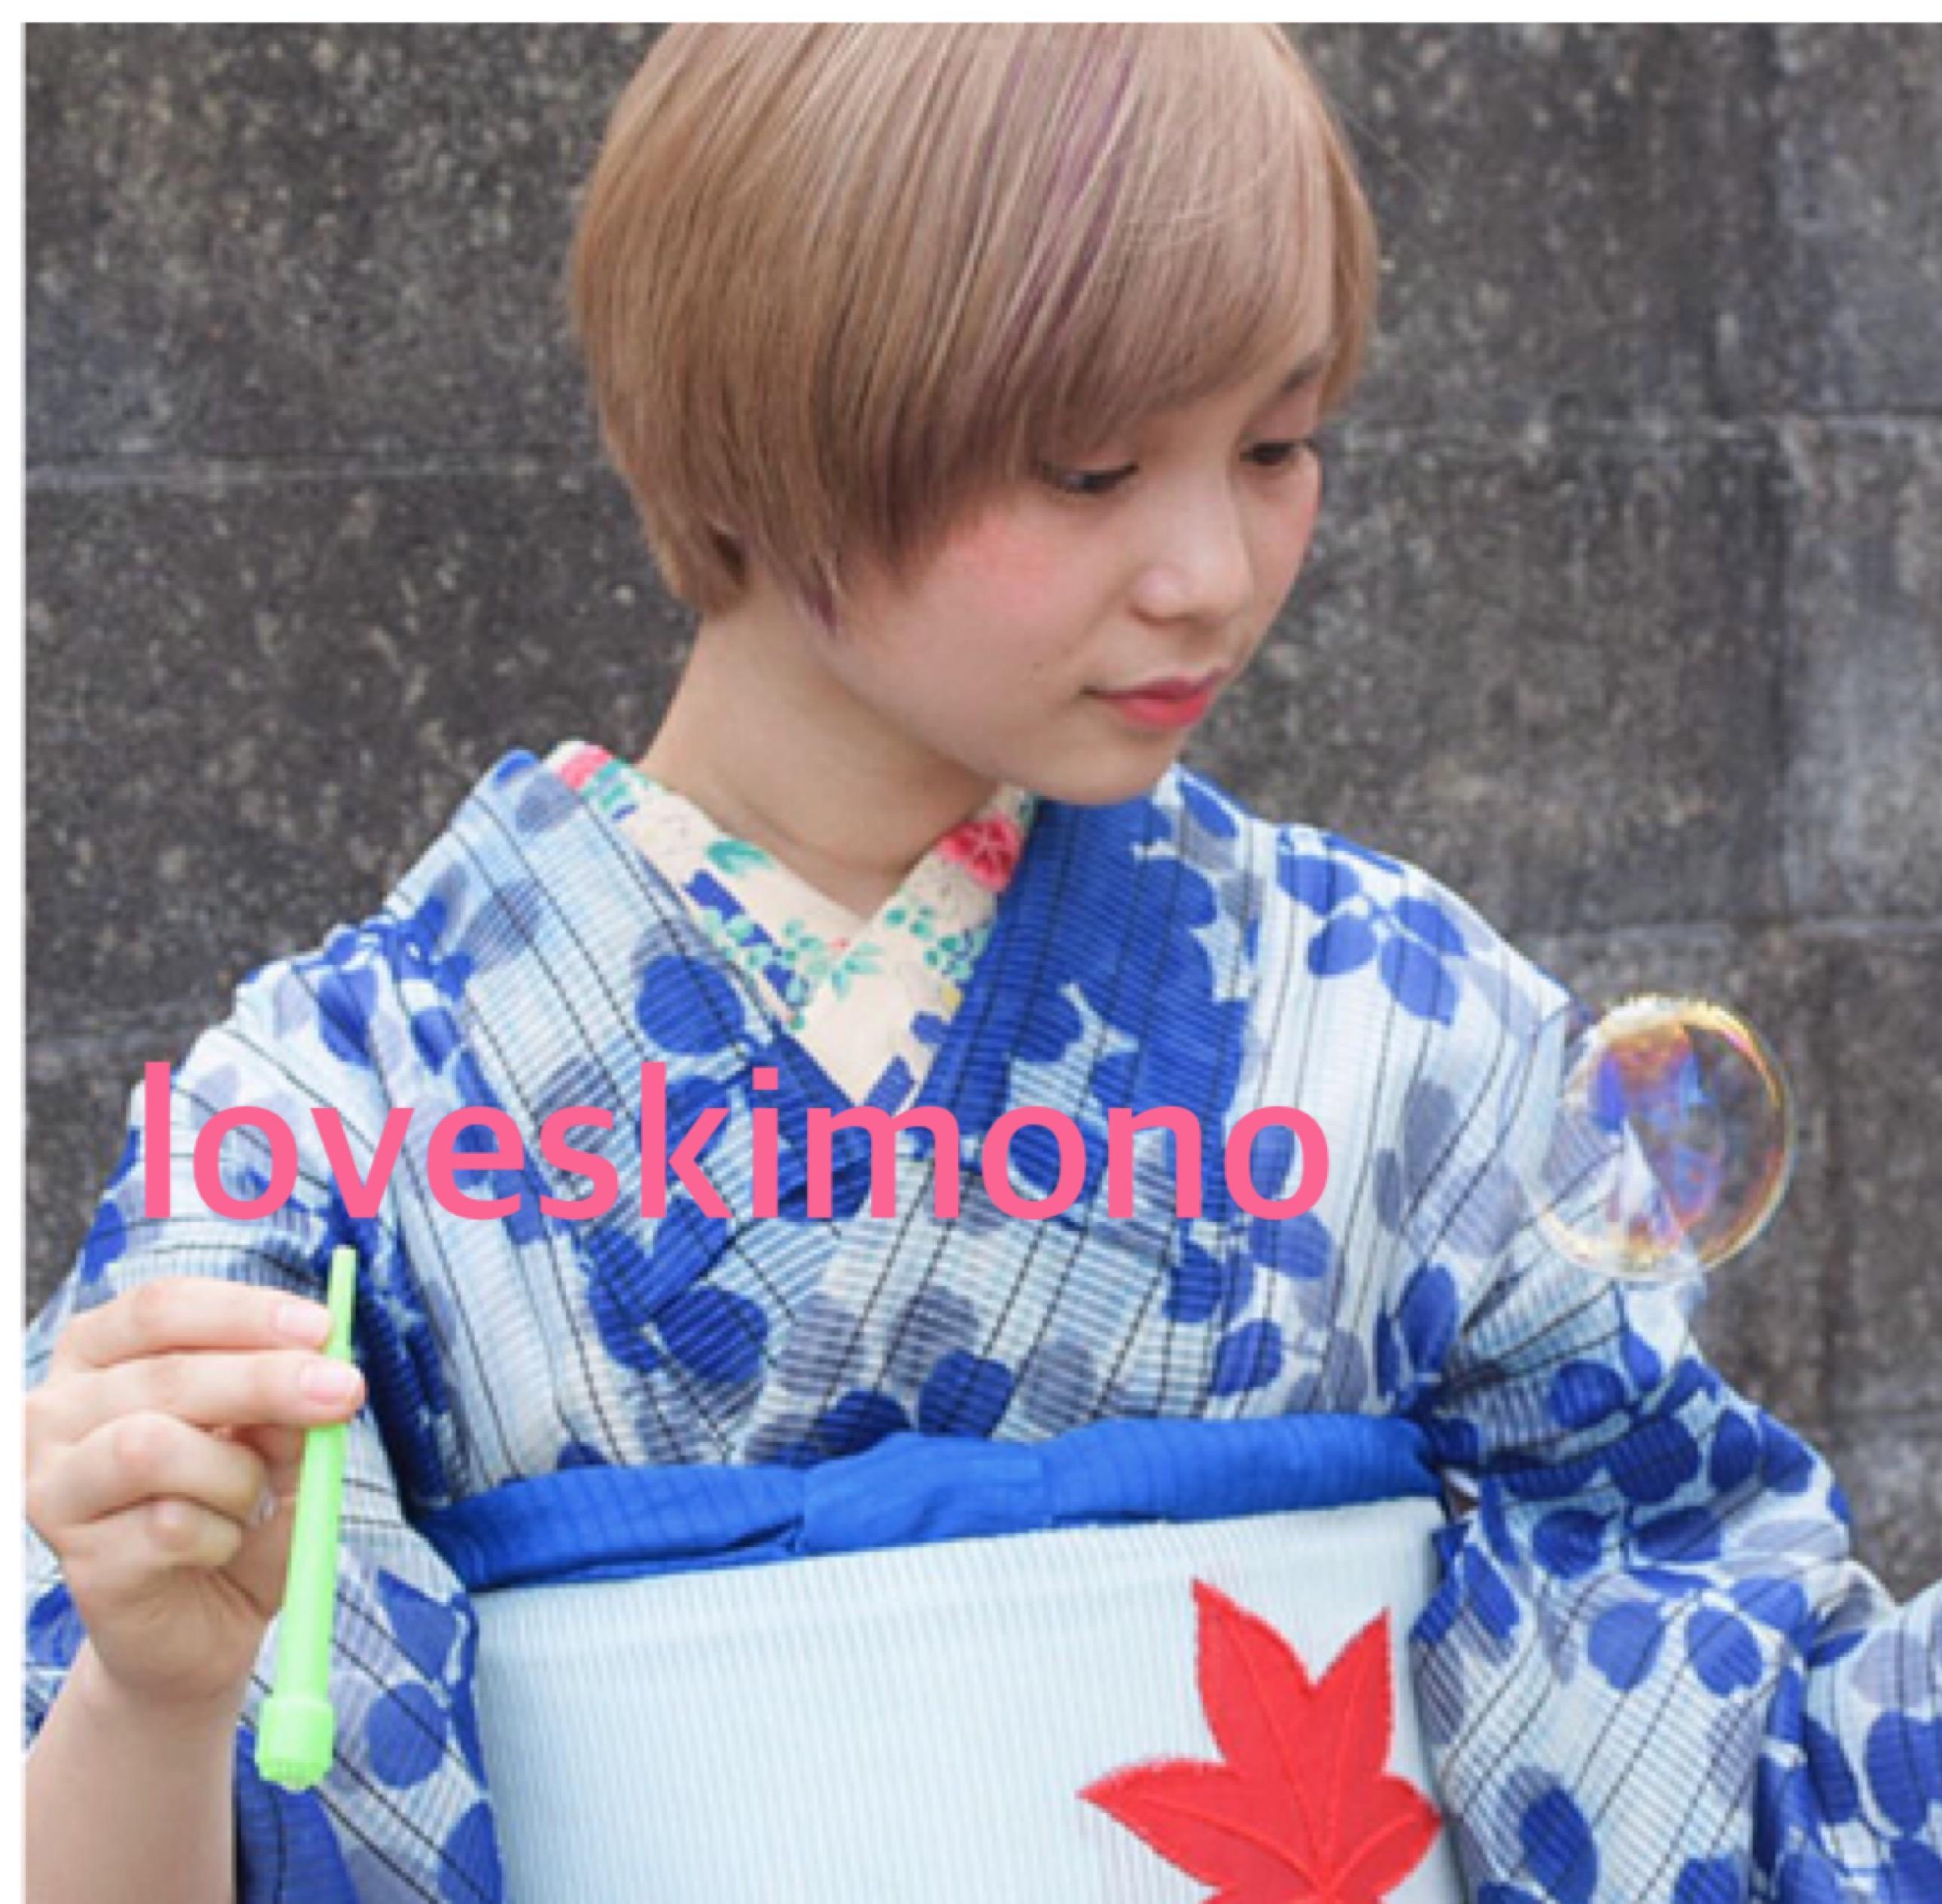 loveskimono ラブズキモノ(リサイクル着物)